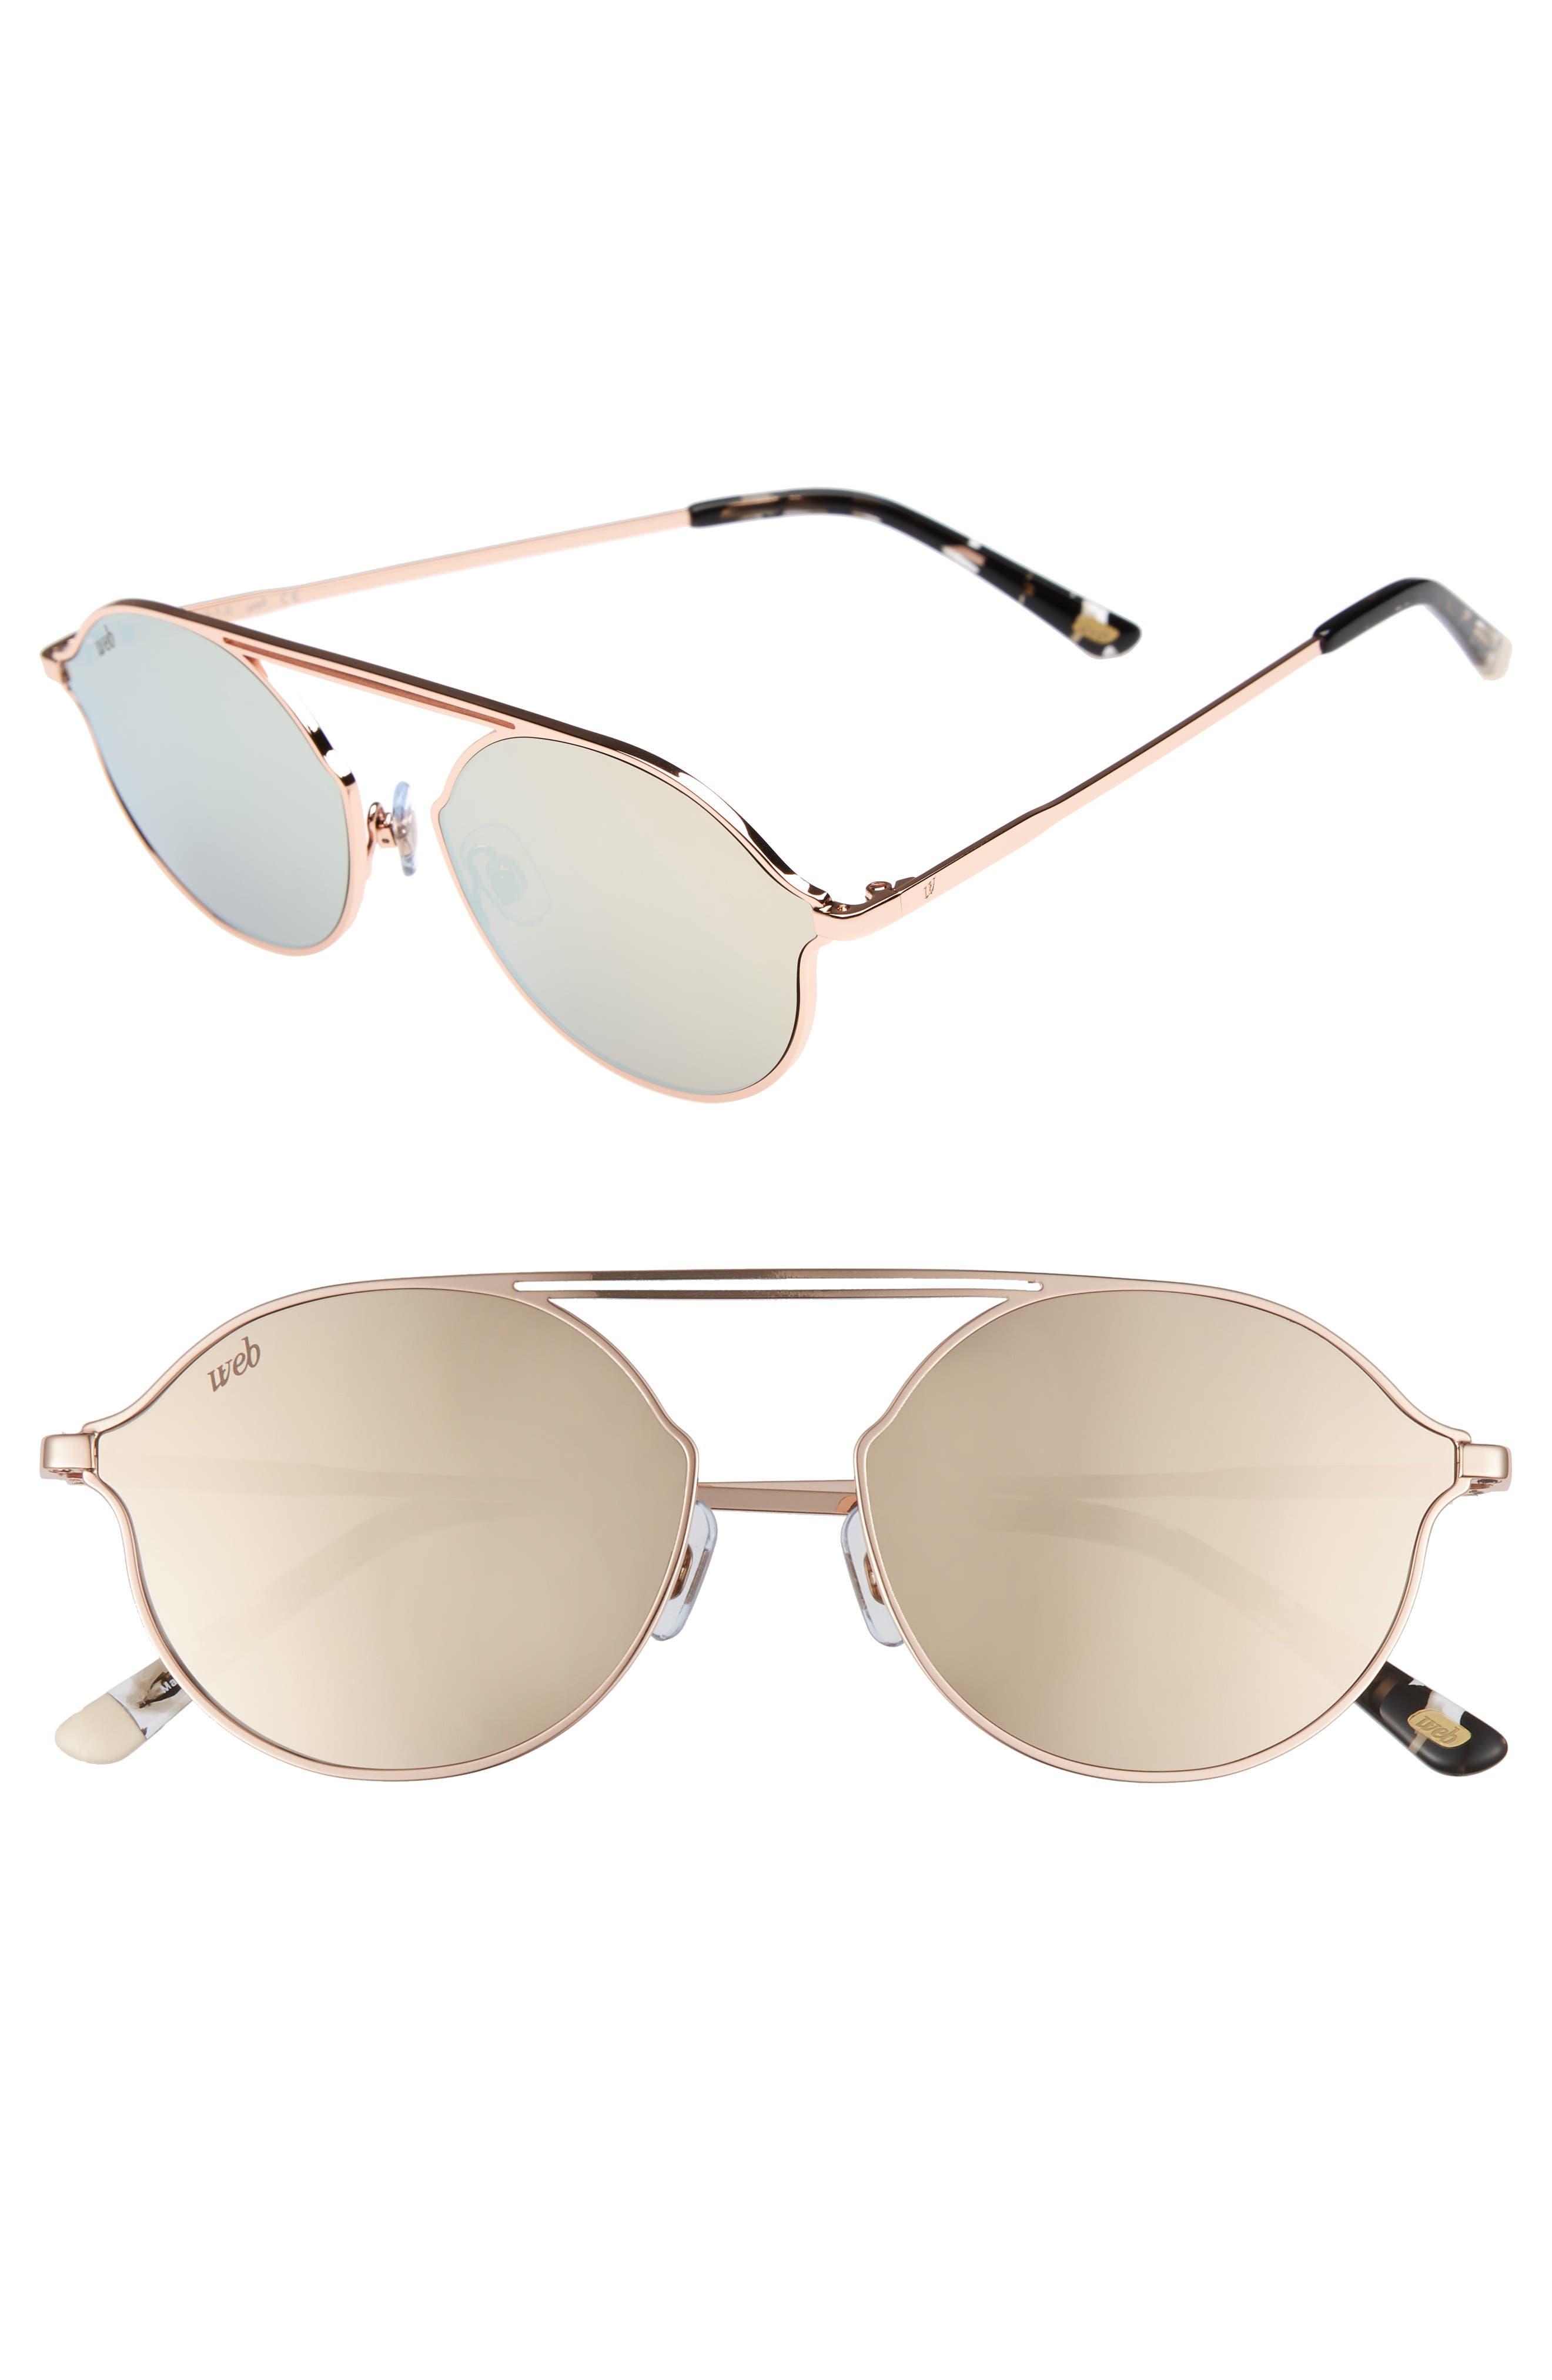 57mm Round Sunglasses,                         Main,                         color, Light Bronze/ Brown Mirror